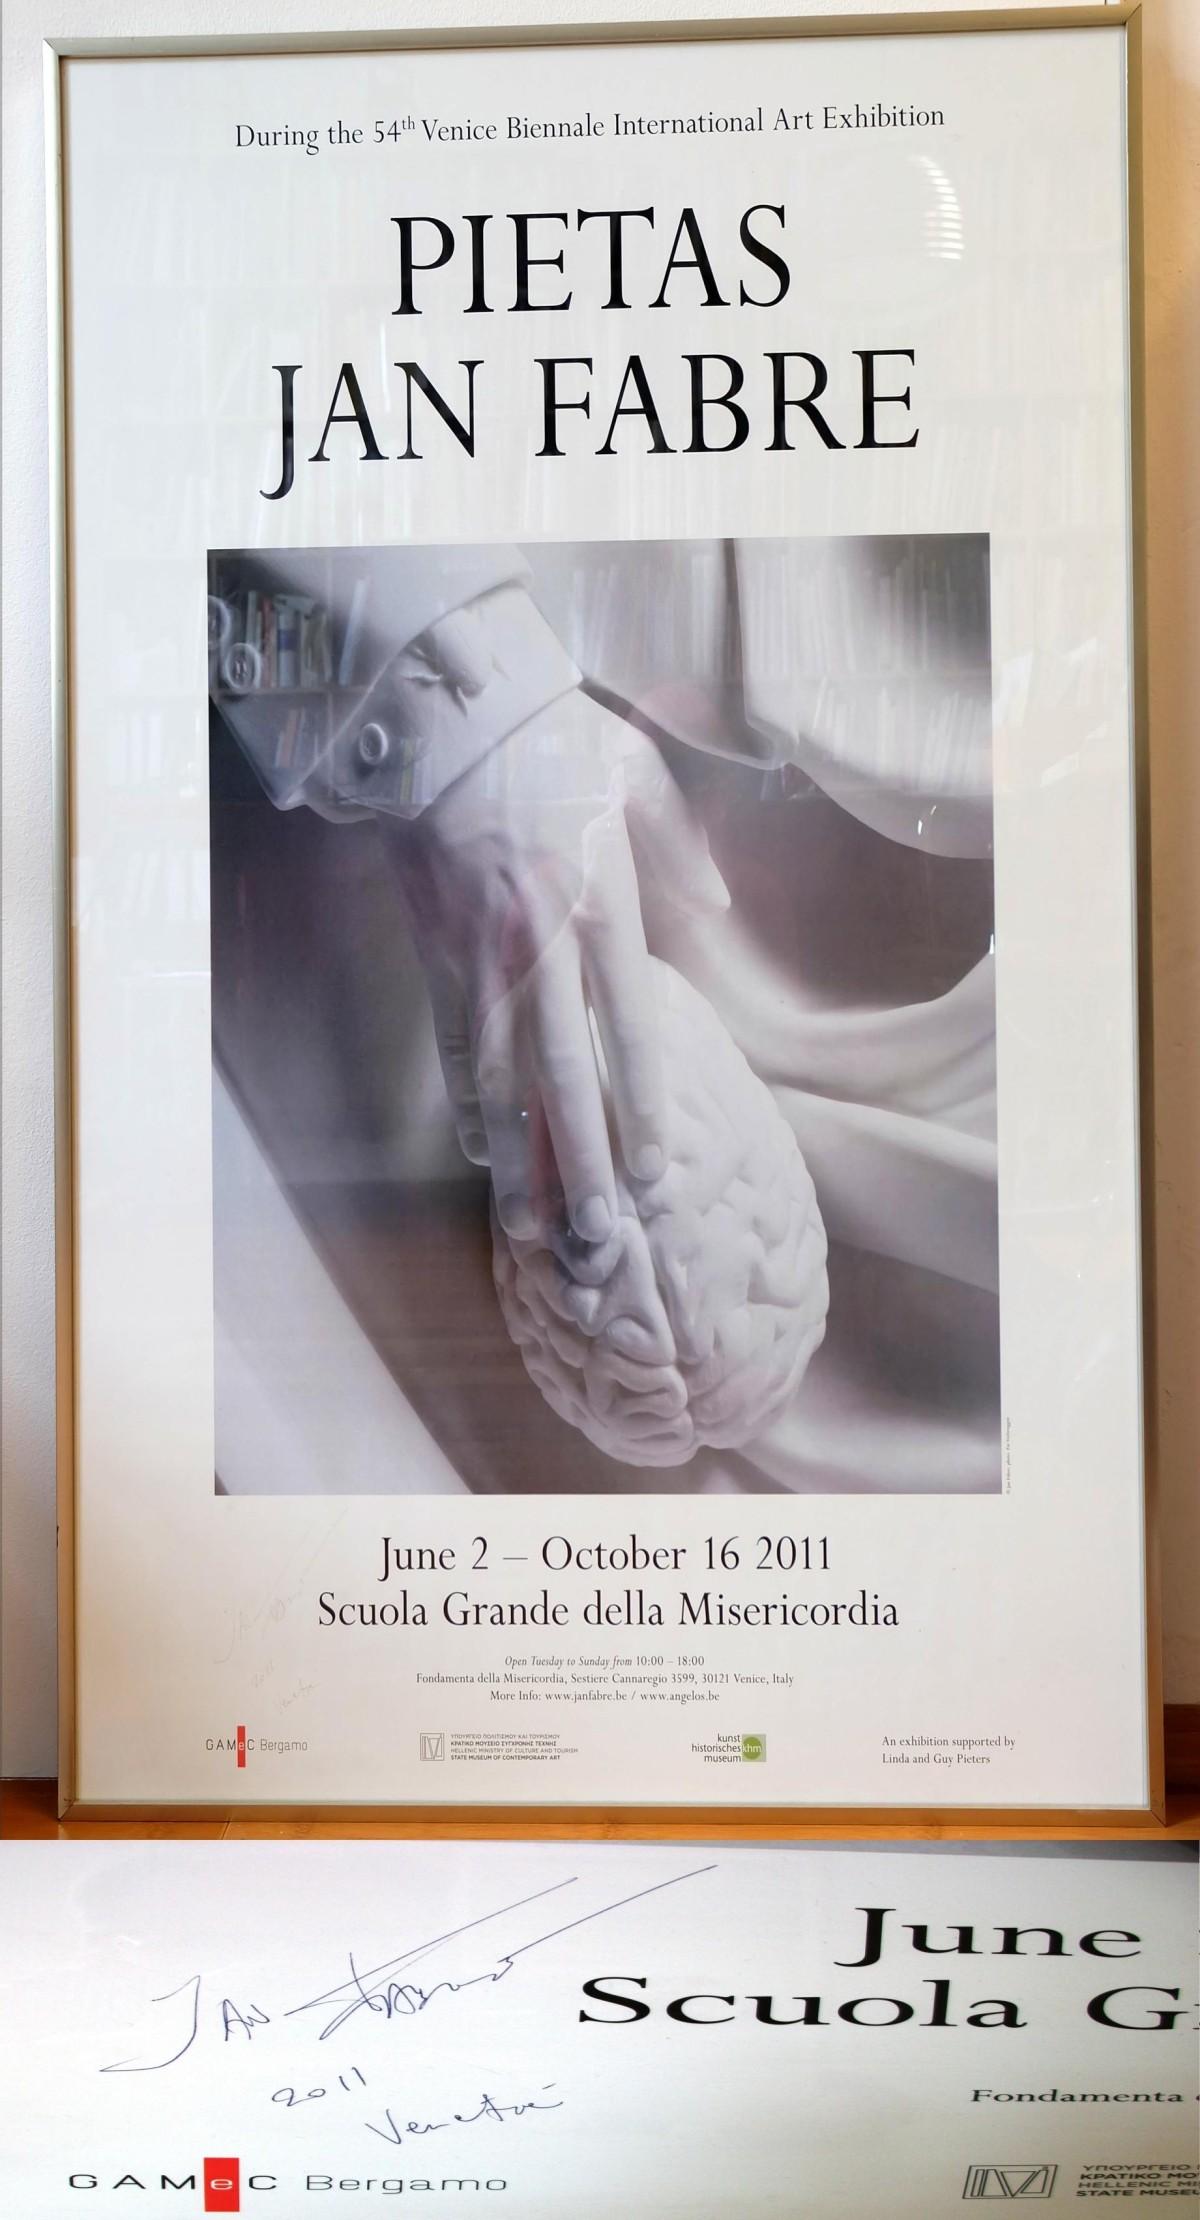 Jan Fabre - Pietas 54. Biennale Vendedig, 2011 Original Hand Signed kopen? Bied vanaf 580!